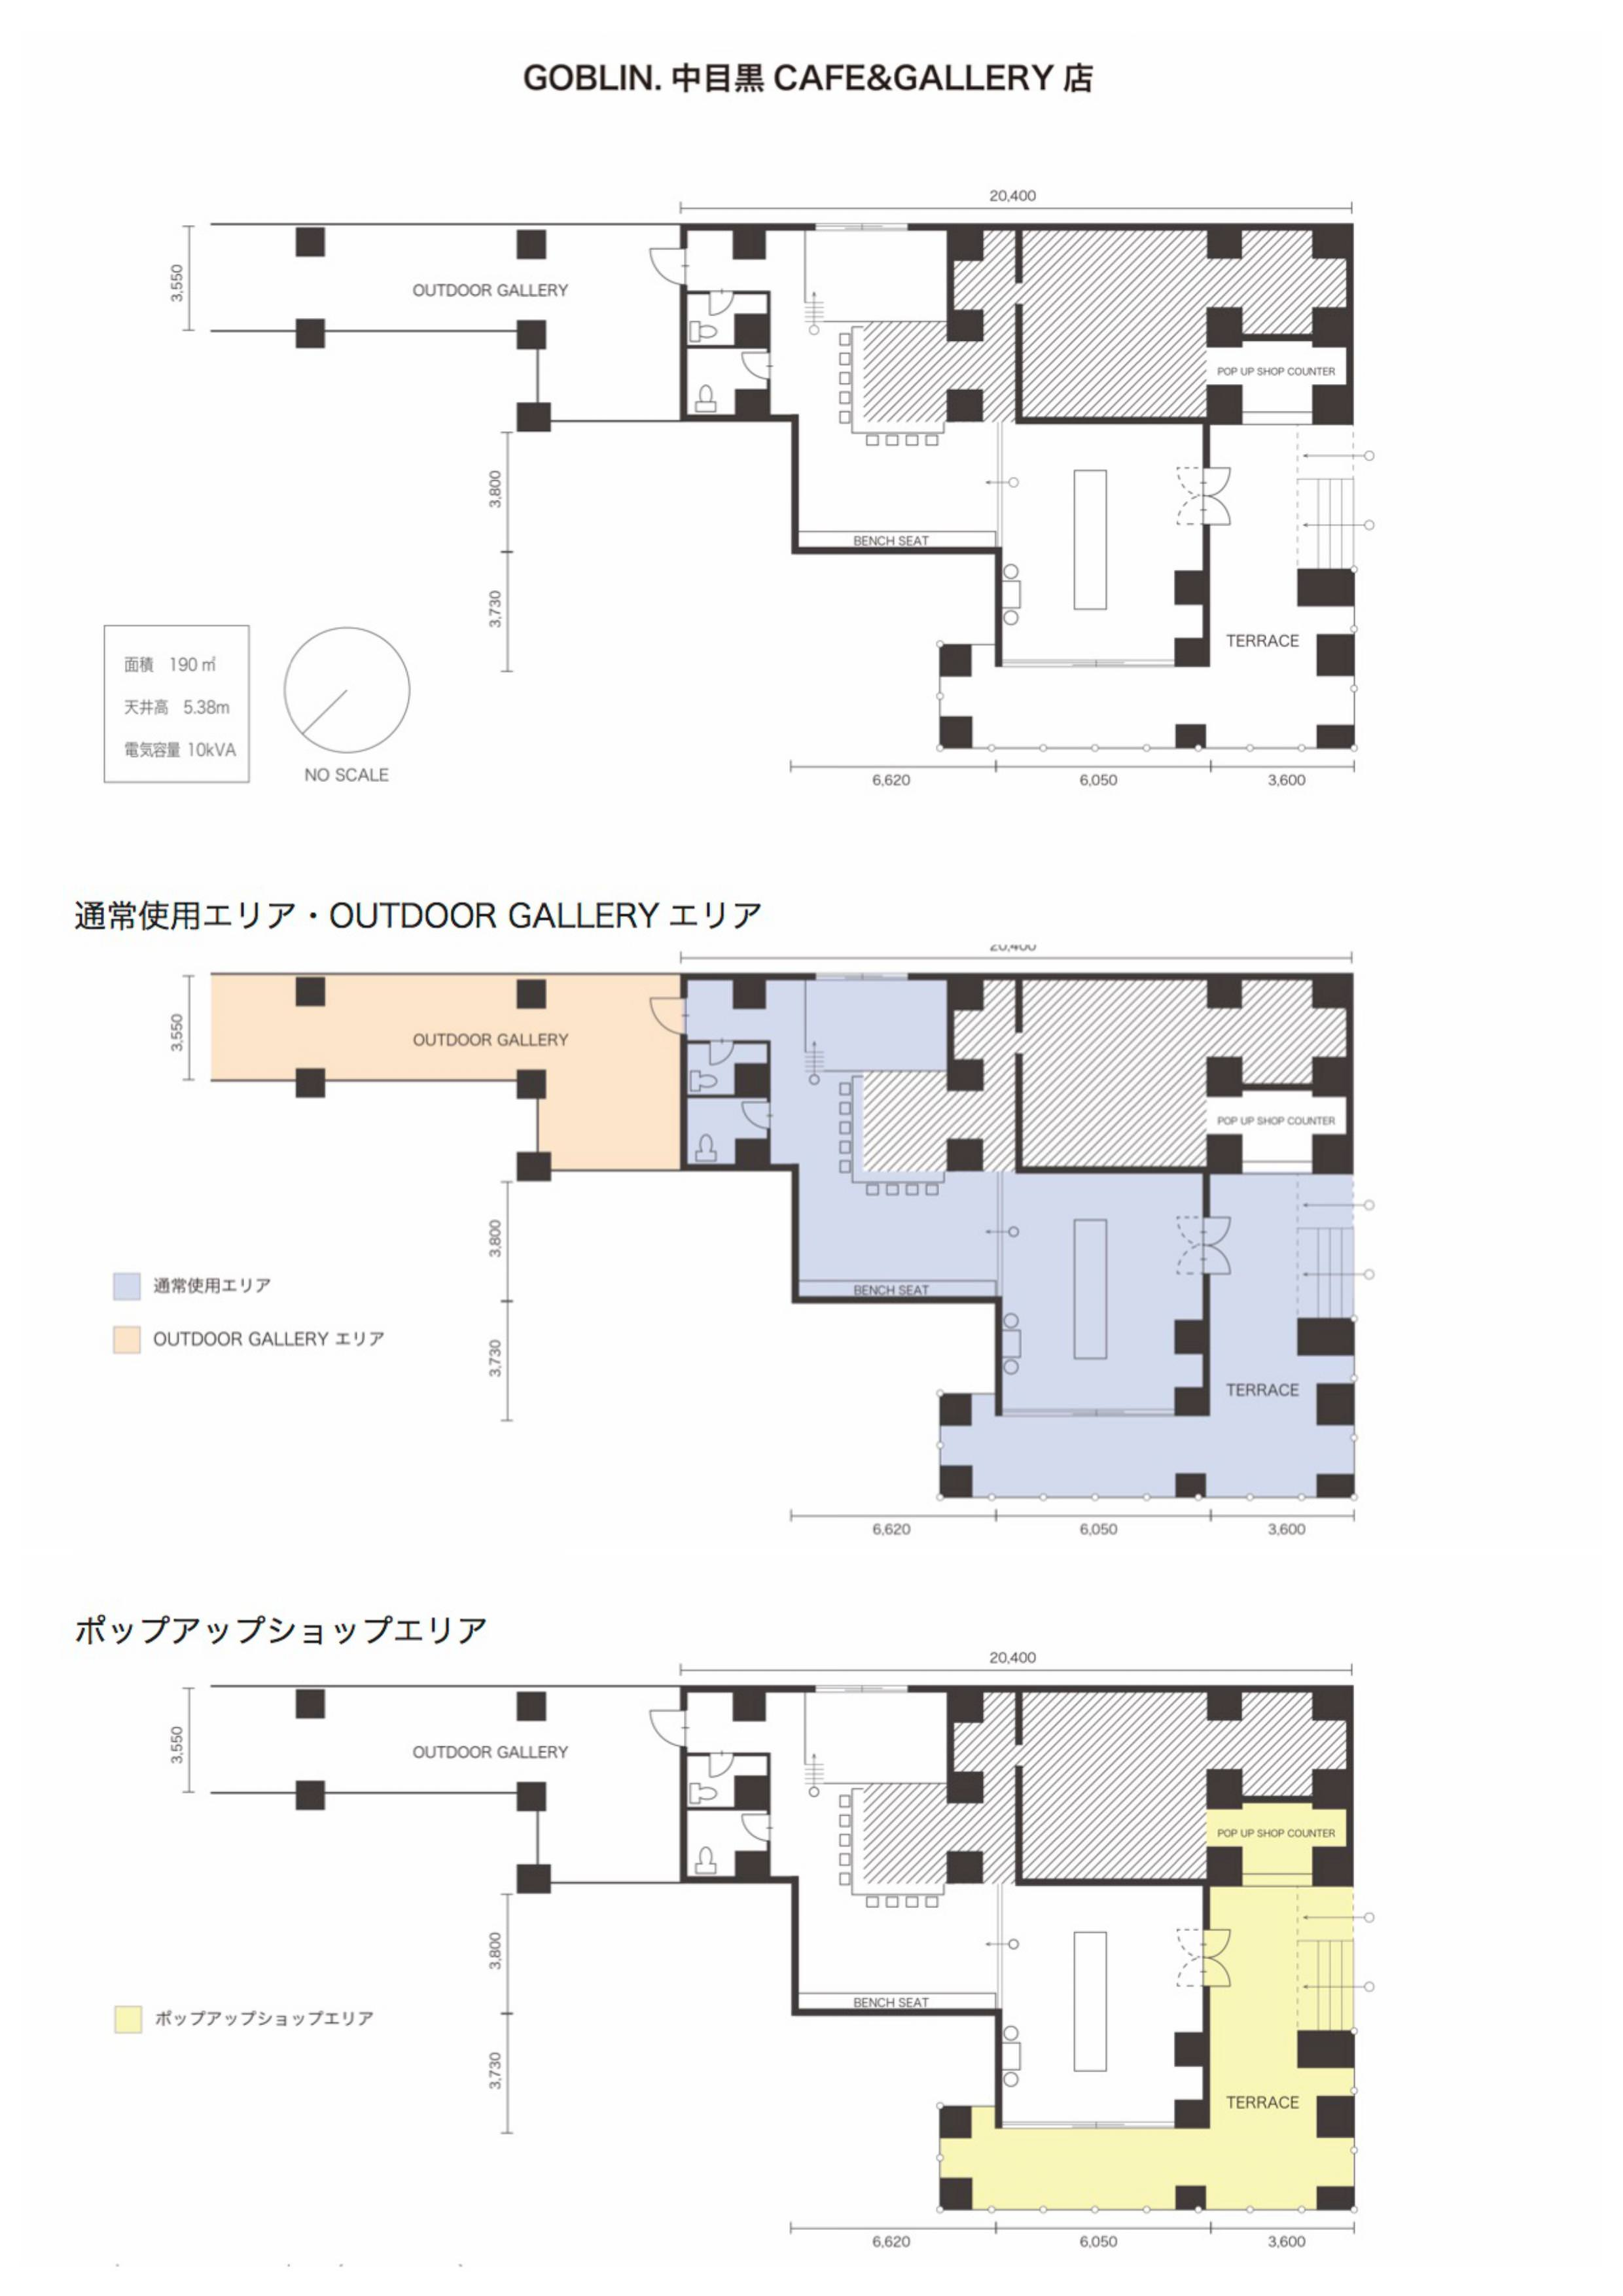 GOBLIN.中目黒CAFE&GALLERY店平面図